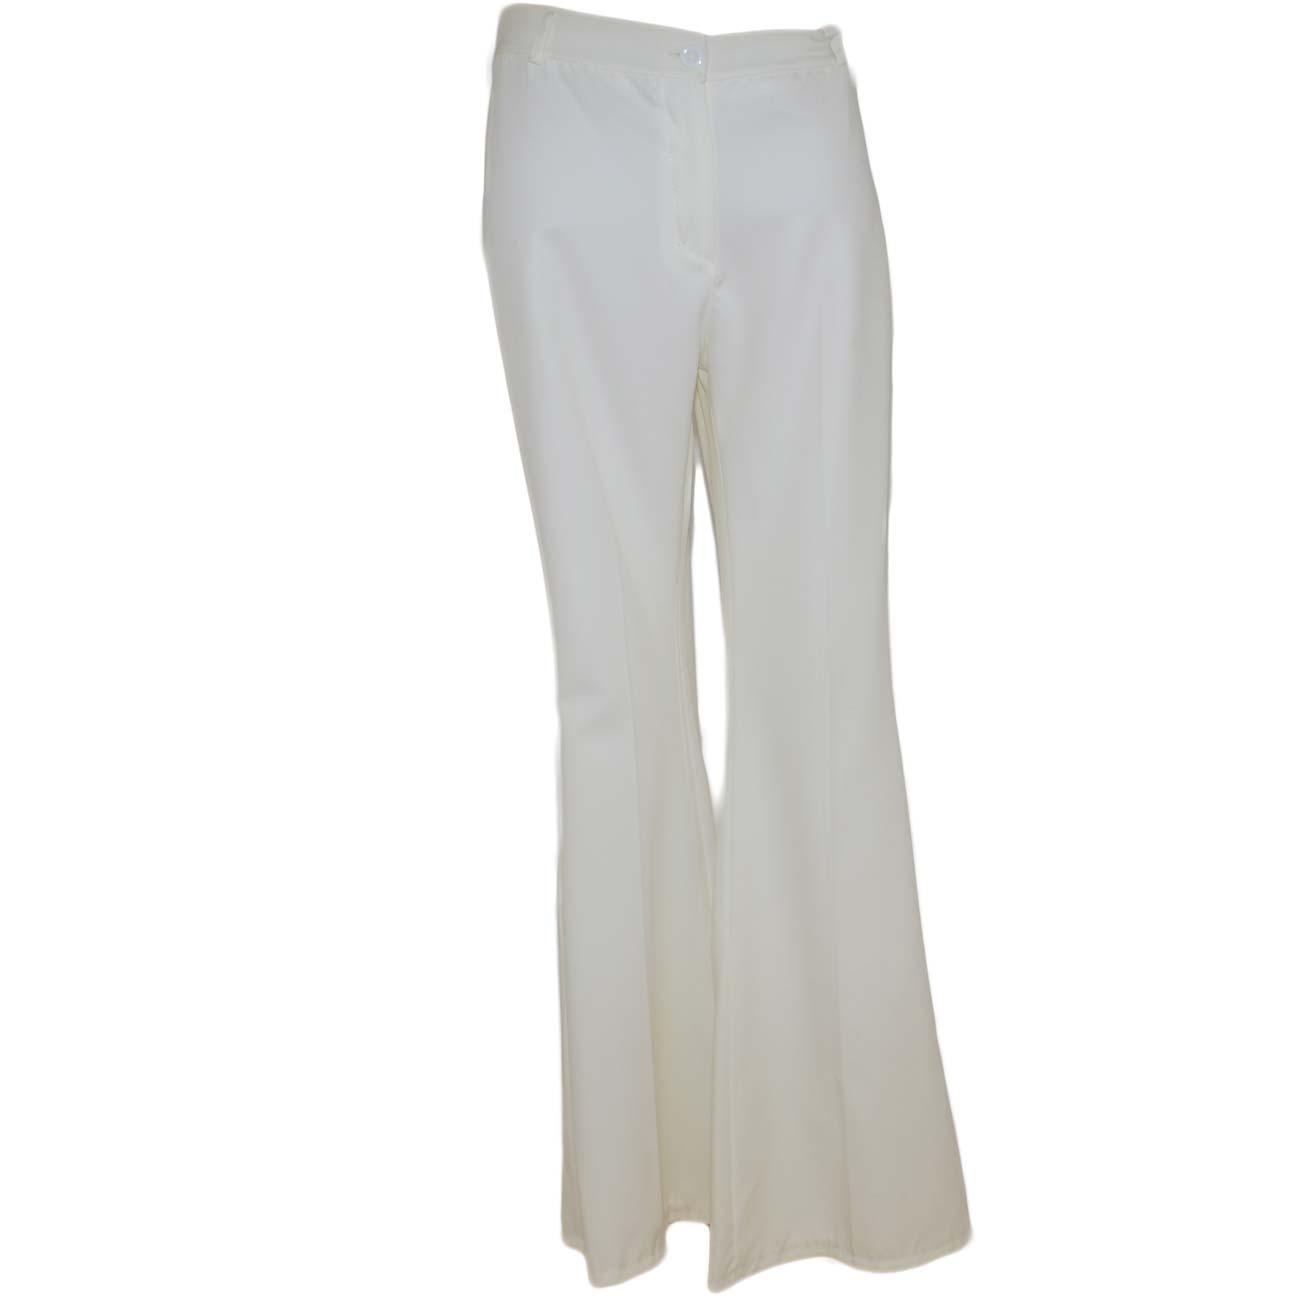 fe7603db50 Pantaloni donna a zampa bianchi a vita alta di cotone sexy slim aderenti  tinta unita bell-botton push up donna pantaloni Malu Shoes | MaluShoes